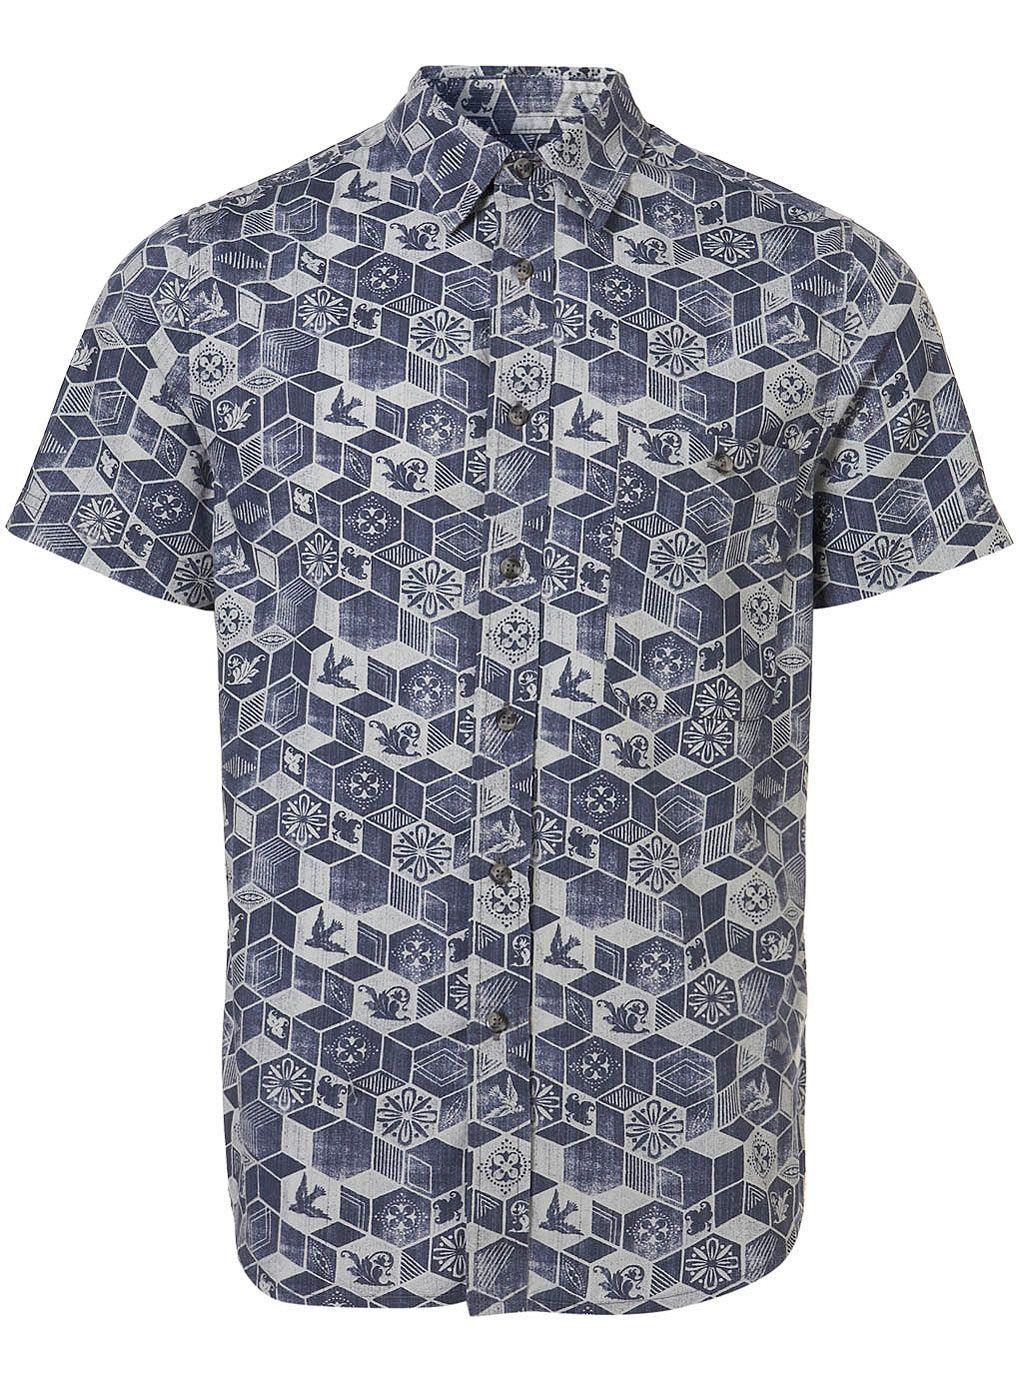 f21584ce5d Blue Woodcut Print Short Sleeve Shirt - Casual Shirts - Mens Shirts -  Clothing - TOPMAN USA